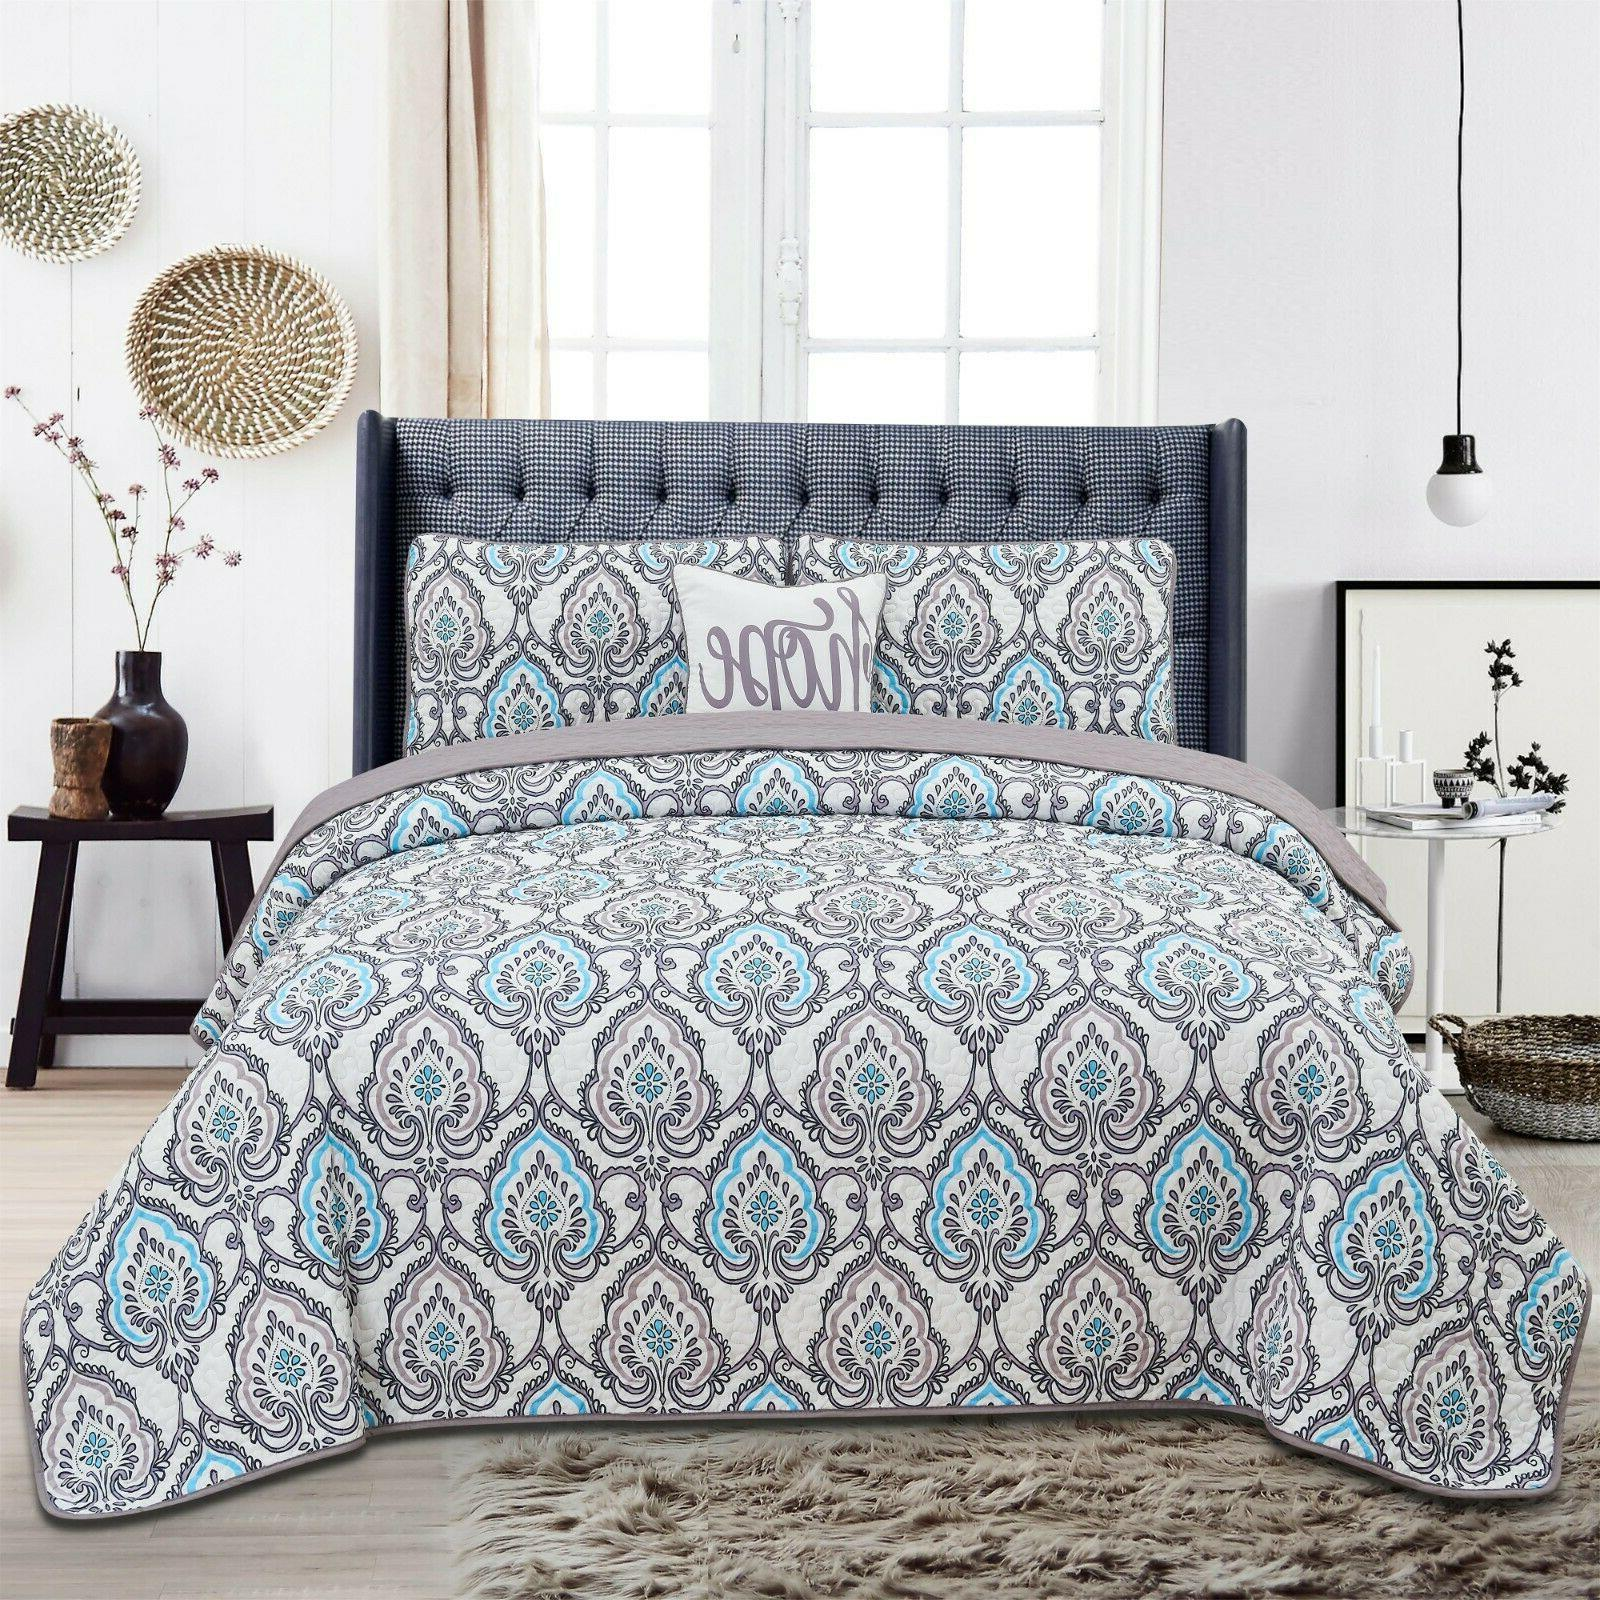 Queen Bedding Quilt King Bedding